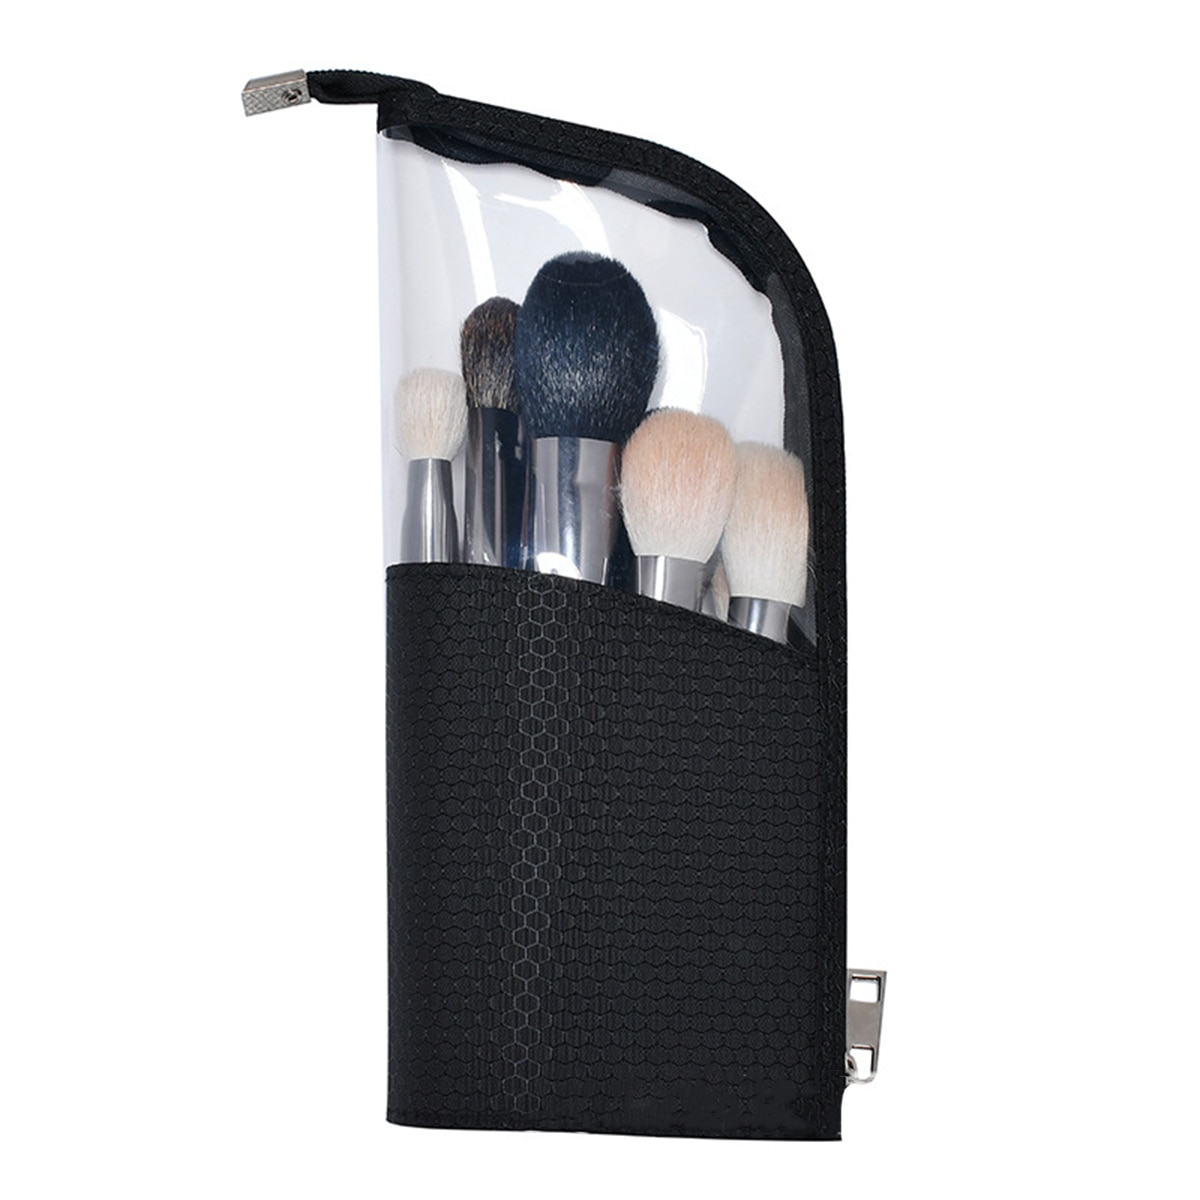 Oxford bolsa de cosméticos hecha de tela de diseño resistente al agua soporte para brochas de maquillaje, organizador de Bolsa-lápiz caso, bolsa de maquillaje